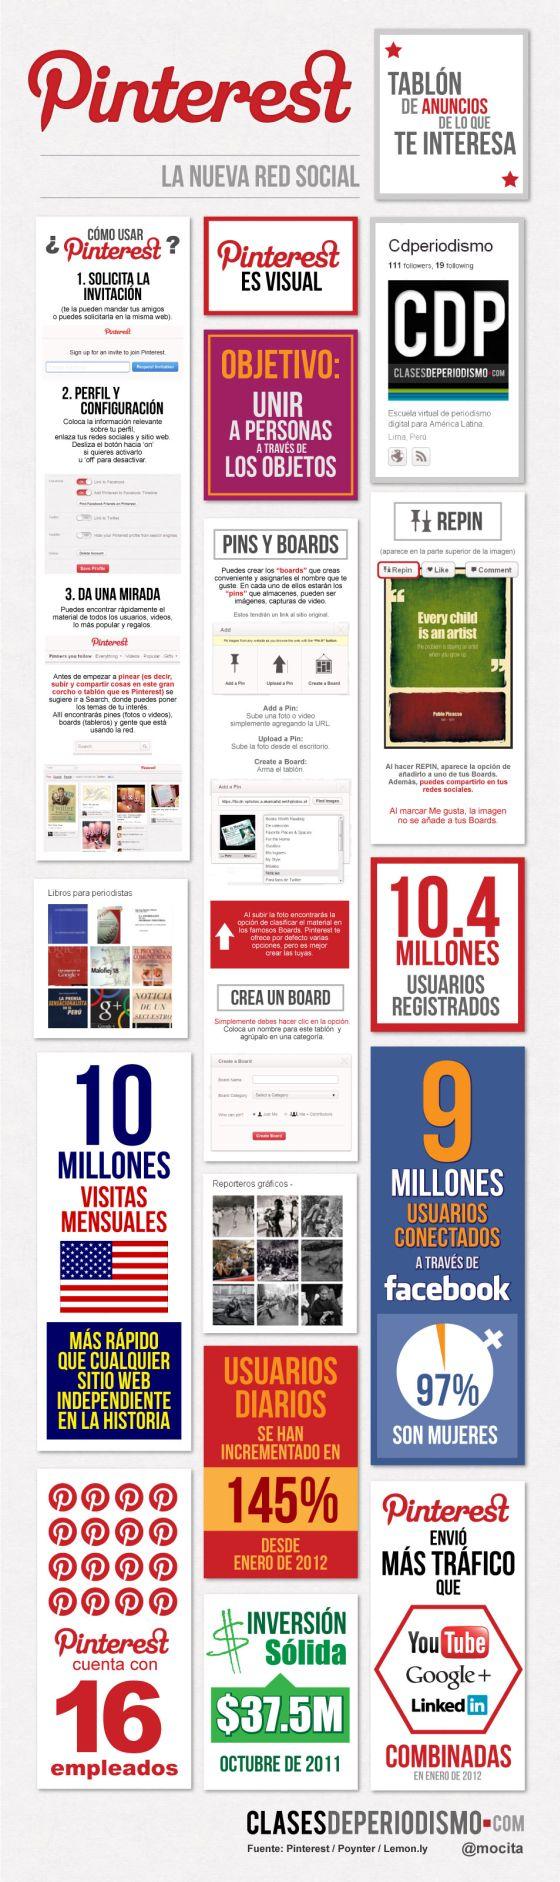 Todo lo que debes saber sobre Pinterest en una #infografia (via @cdperiodismo)